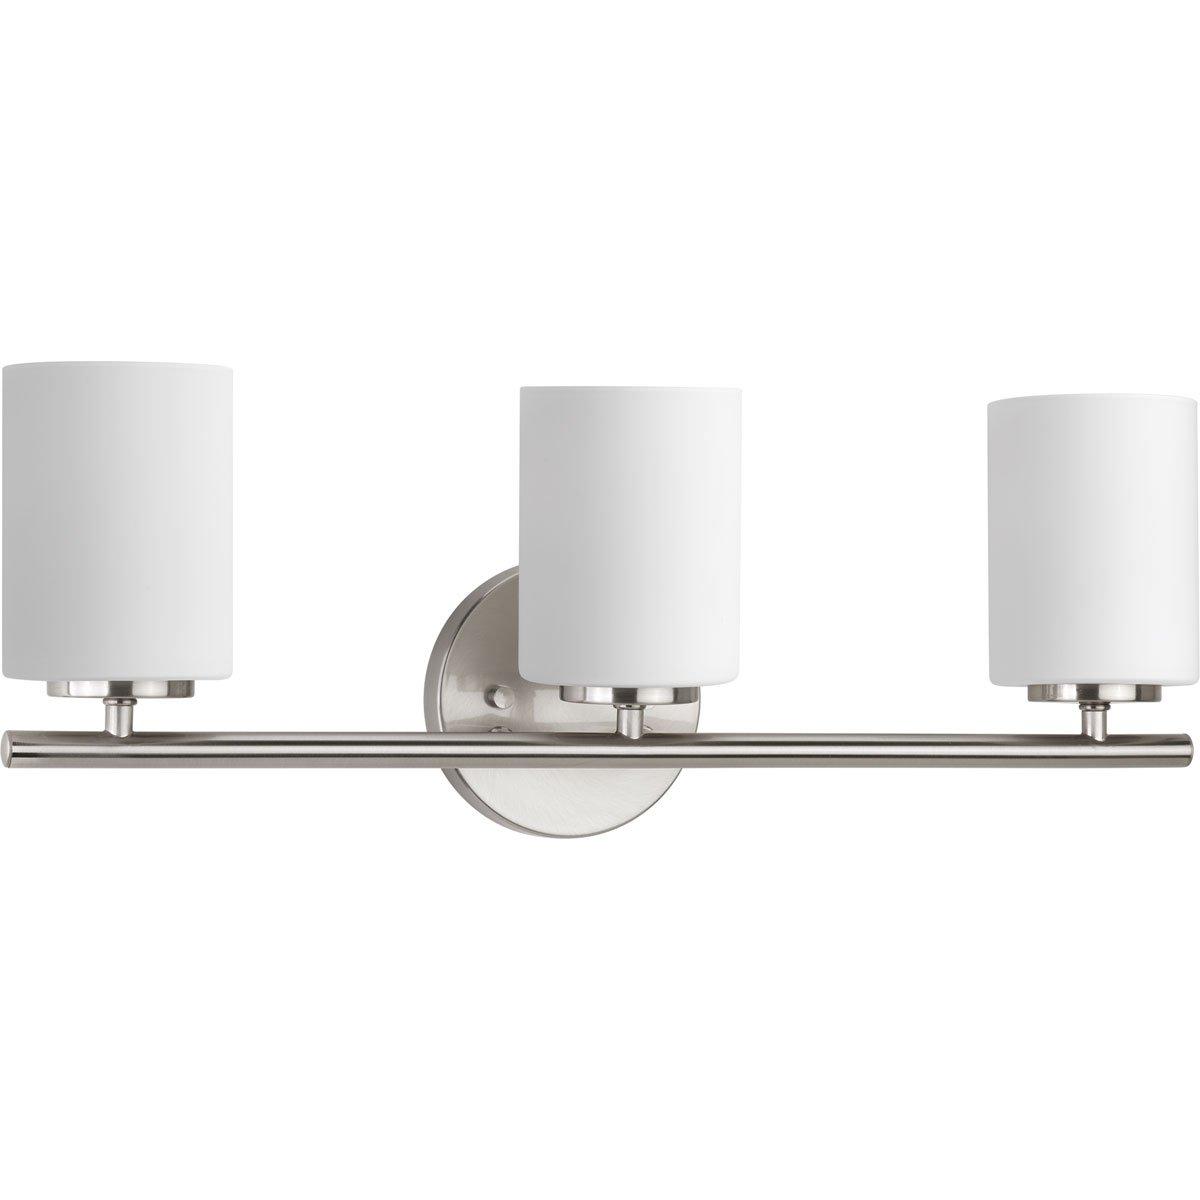 Progress Lighting P2159-09 Contemporary/Soft 3-100W Med Bath Bracket, Brushed Nickel by Progress Lighting (Image #1)